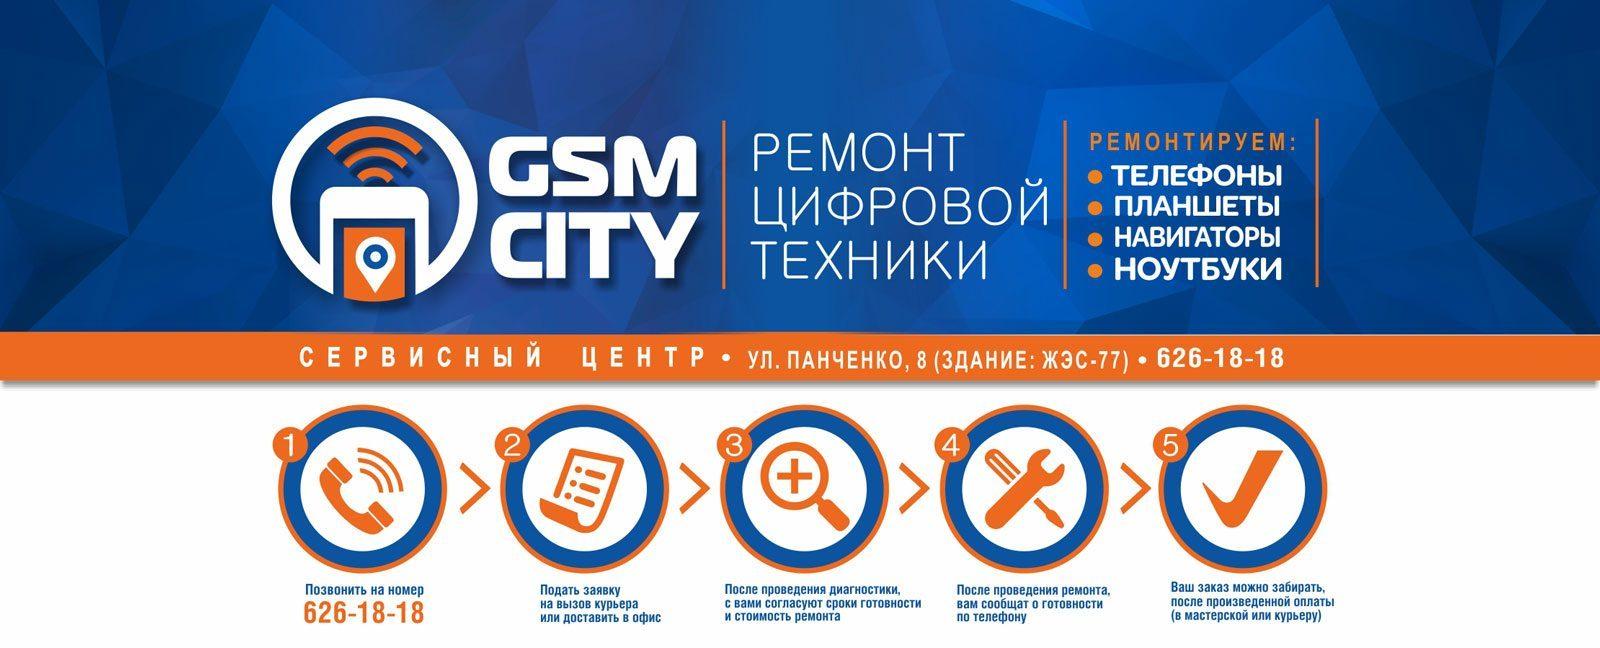 Сервисный Центр GSM-CITY